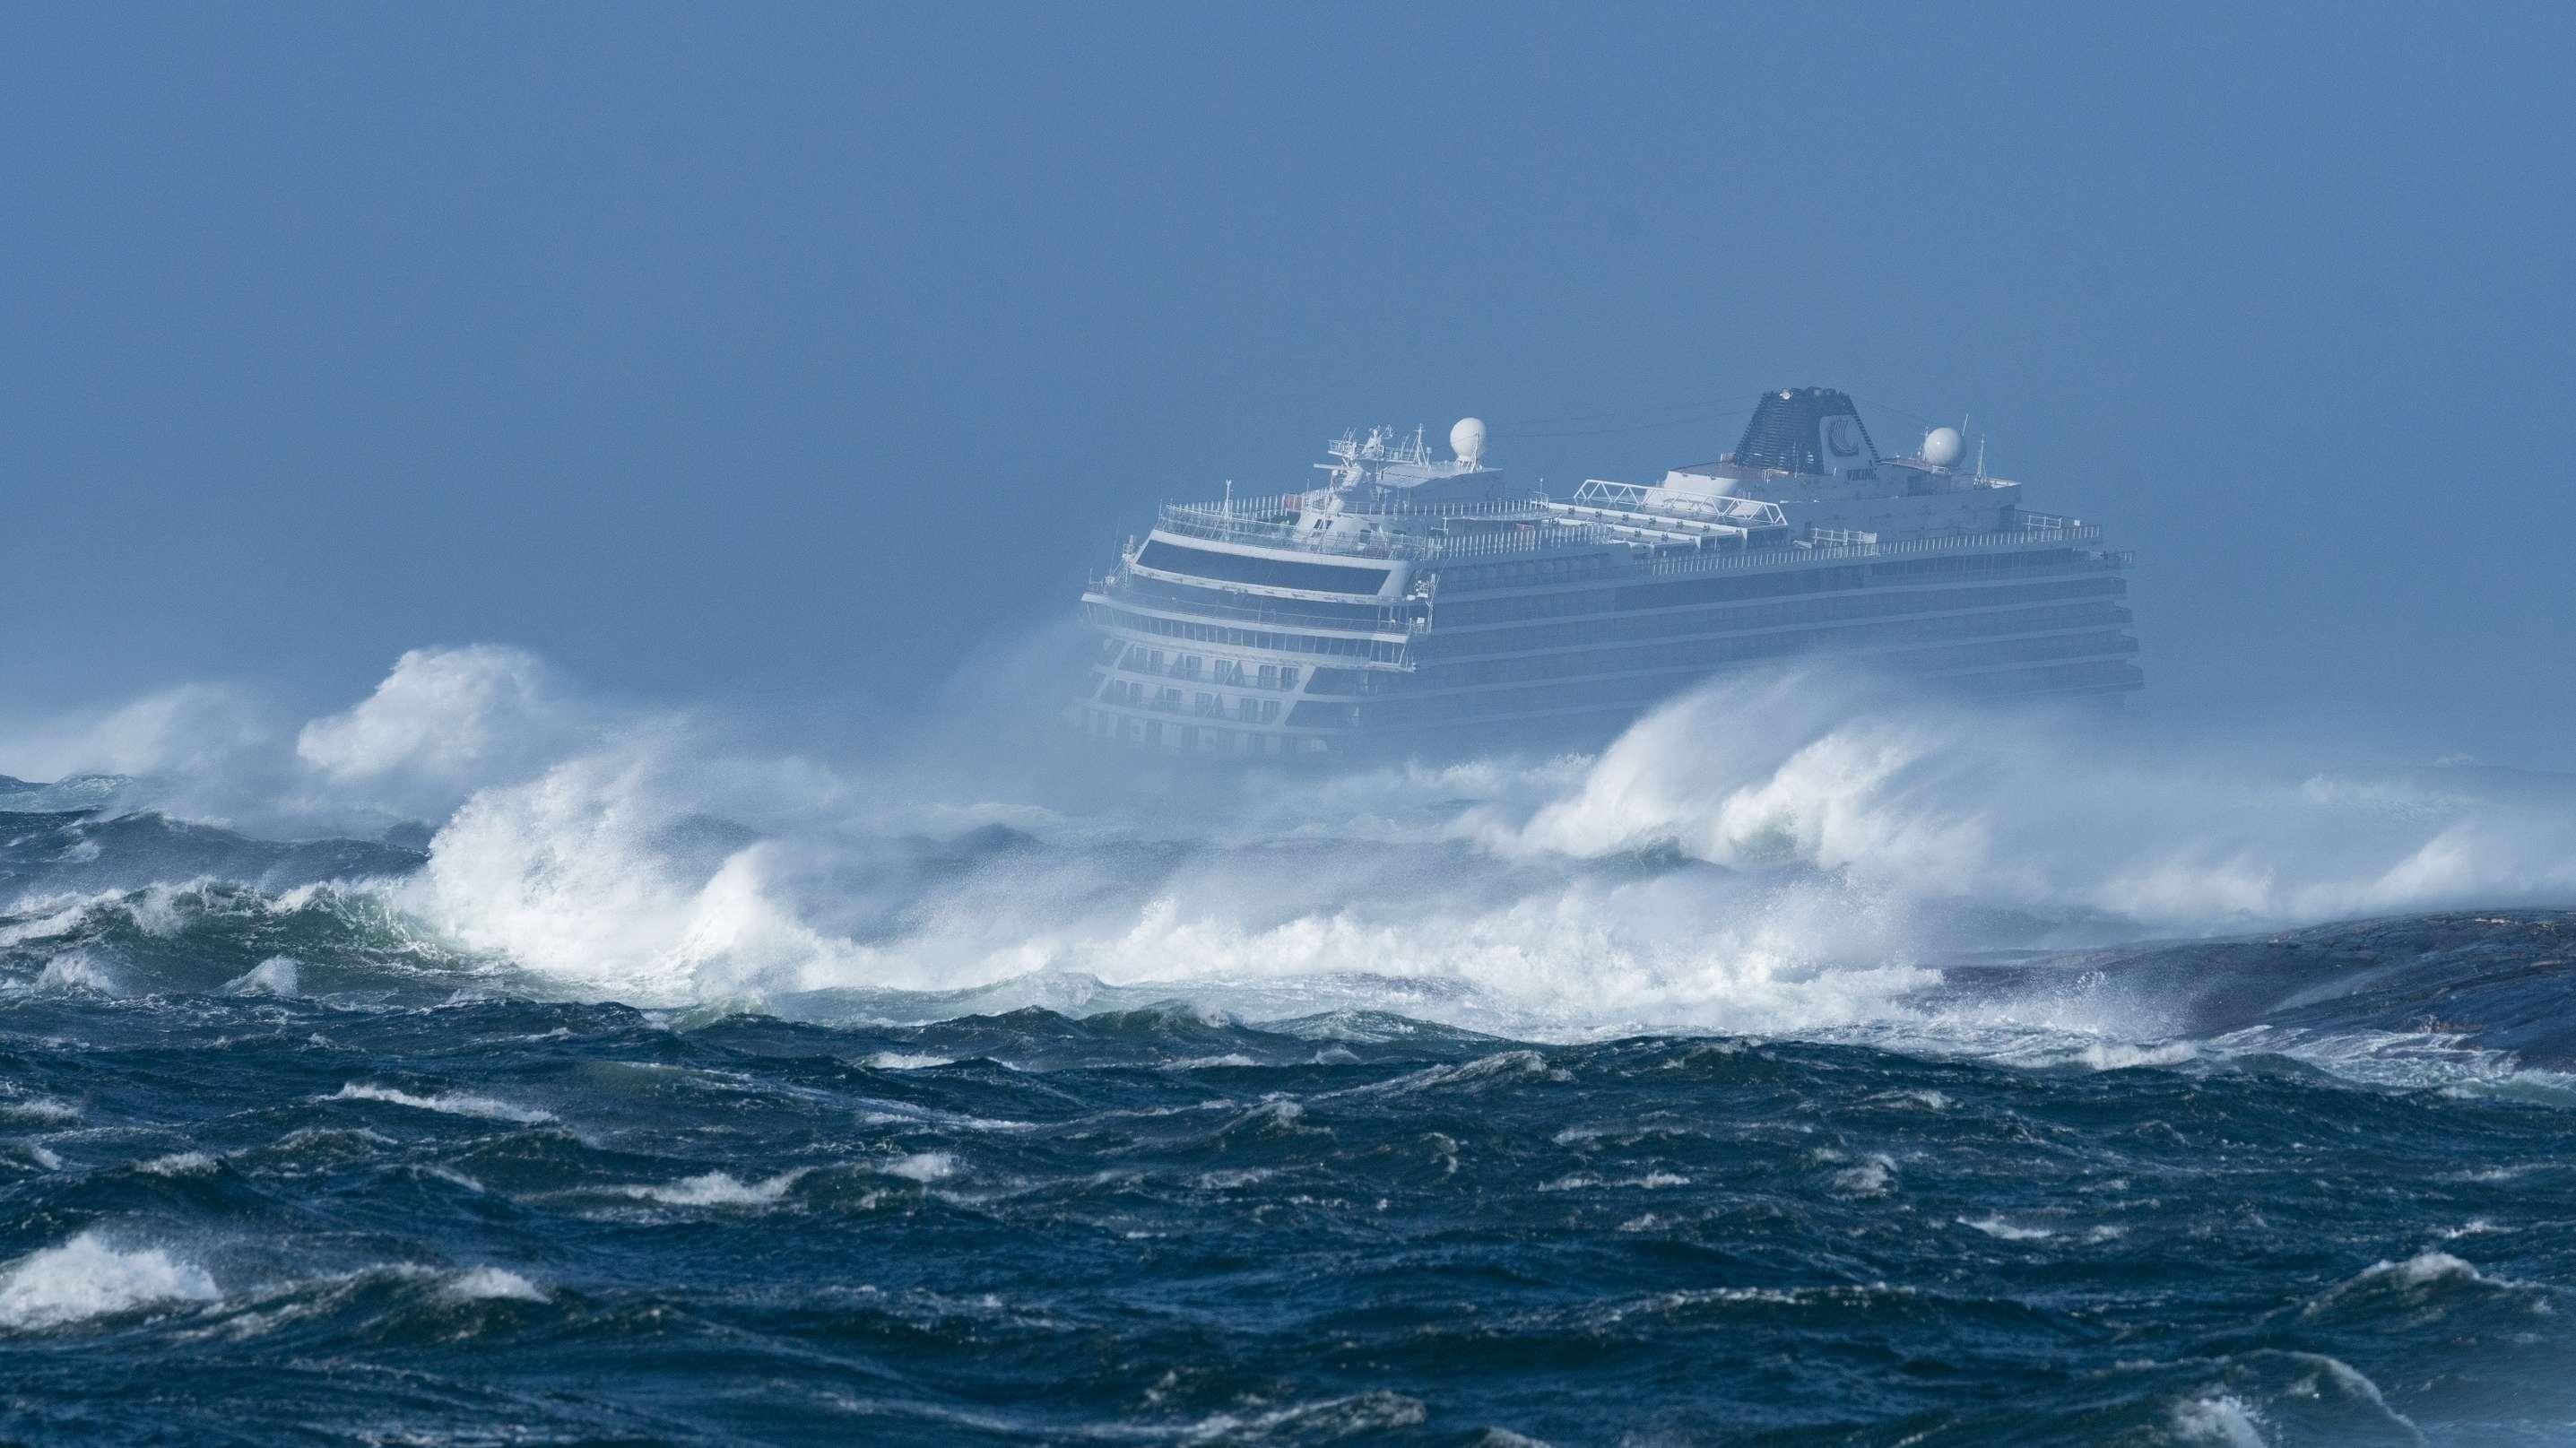 Kreuzfahrtschiff Viking Sky in Seenot